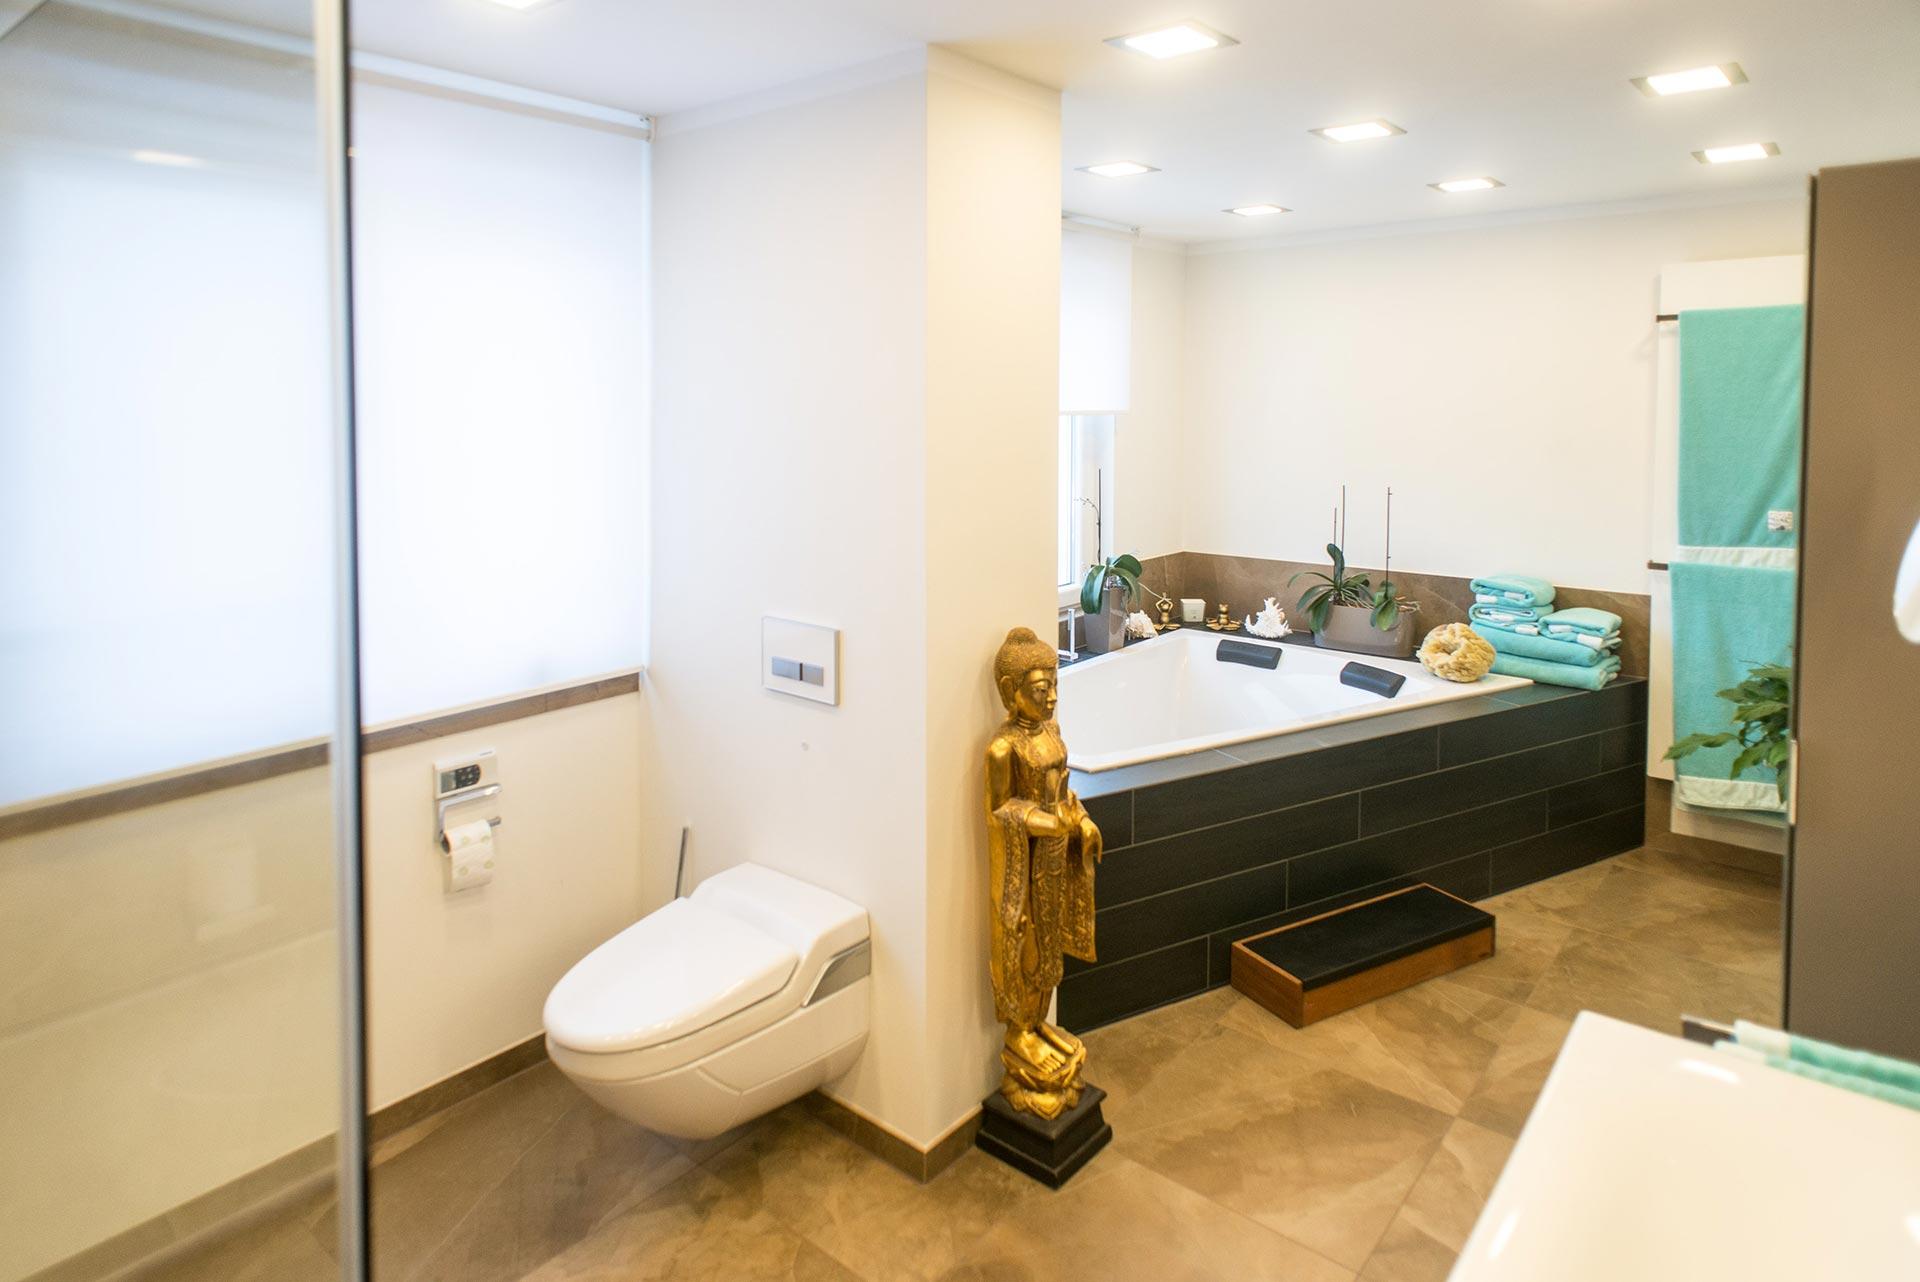 https://wetzl-innenausbau.de/wp-content/uploads/2017/10/innenausbau-wetzl-muenchen-badezimmer-komplettumbau-07.jpg